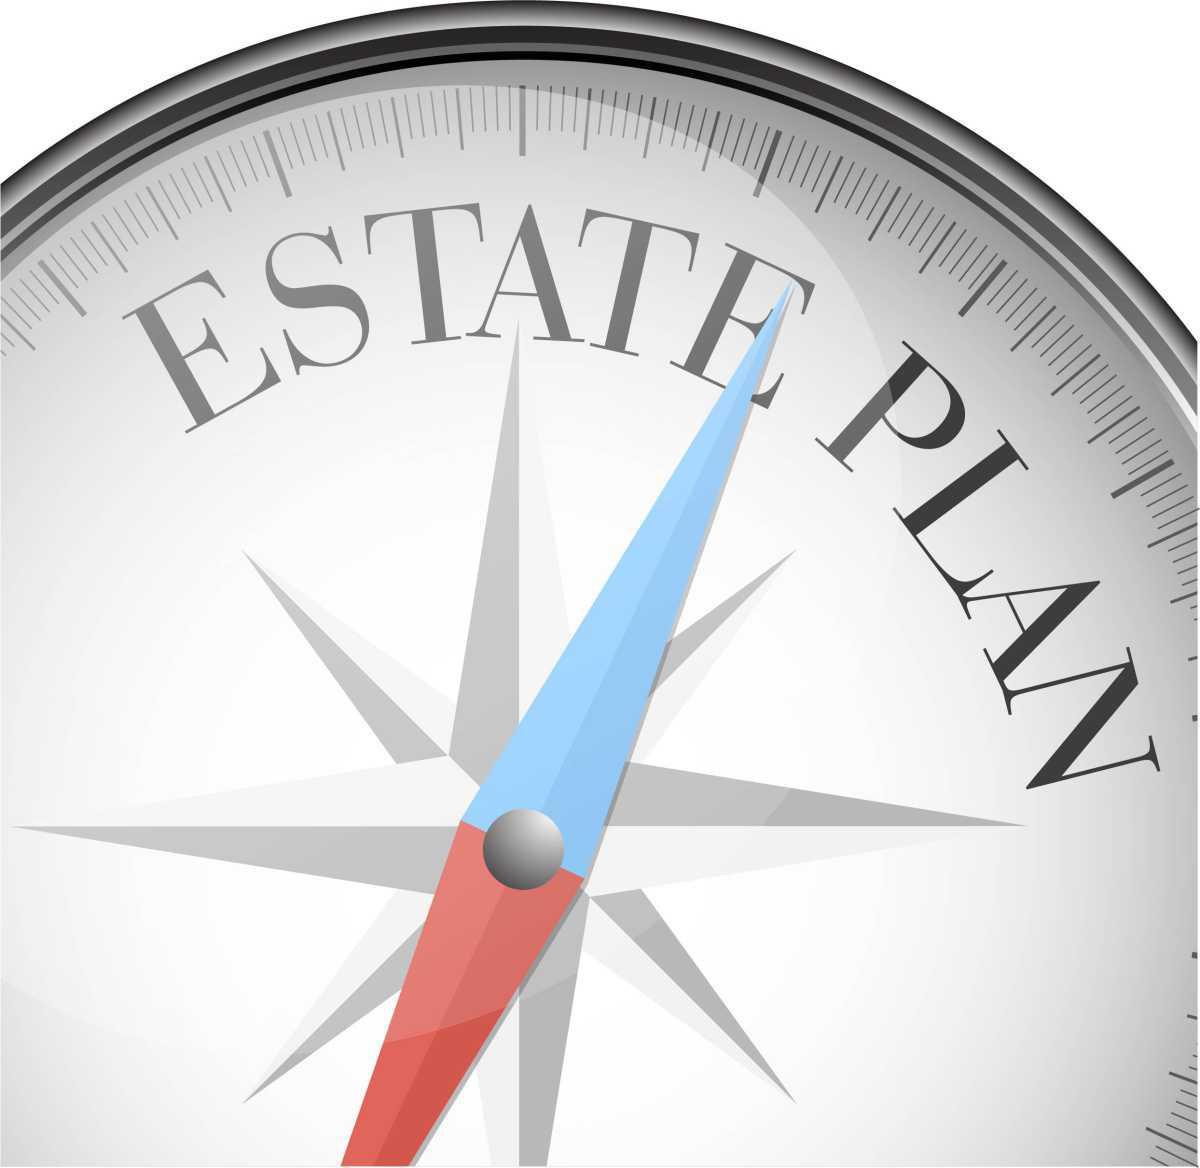 Revising Your Estate Plan